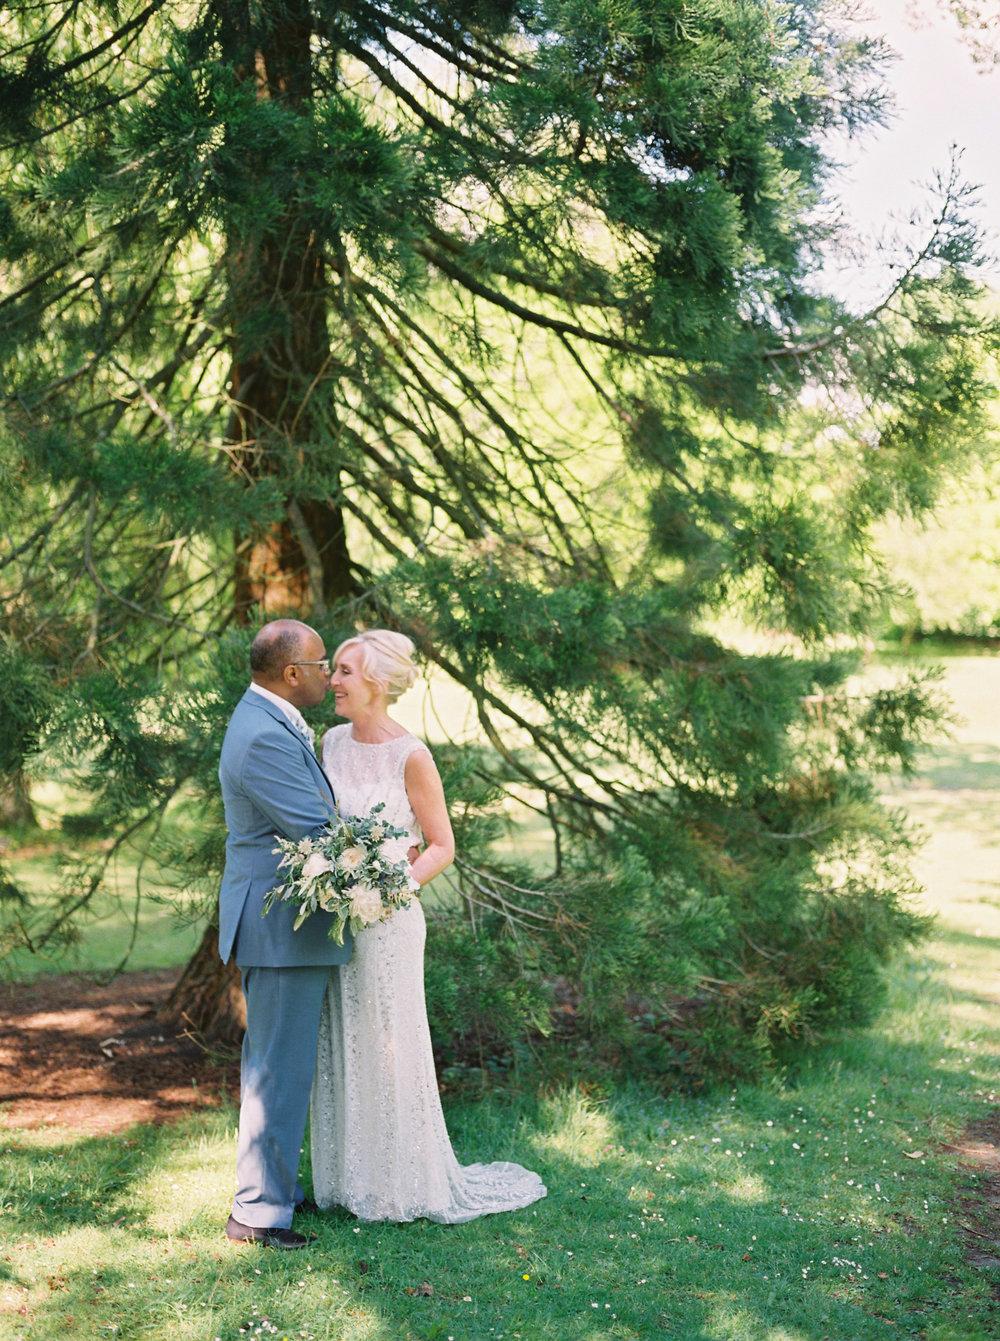 ISAAC & SIMONE - DORSET WEDDING